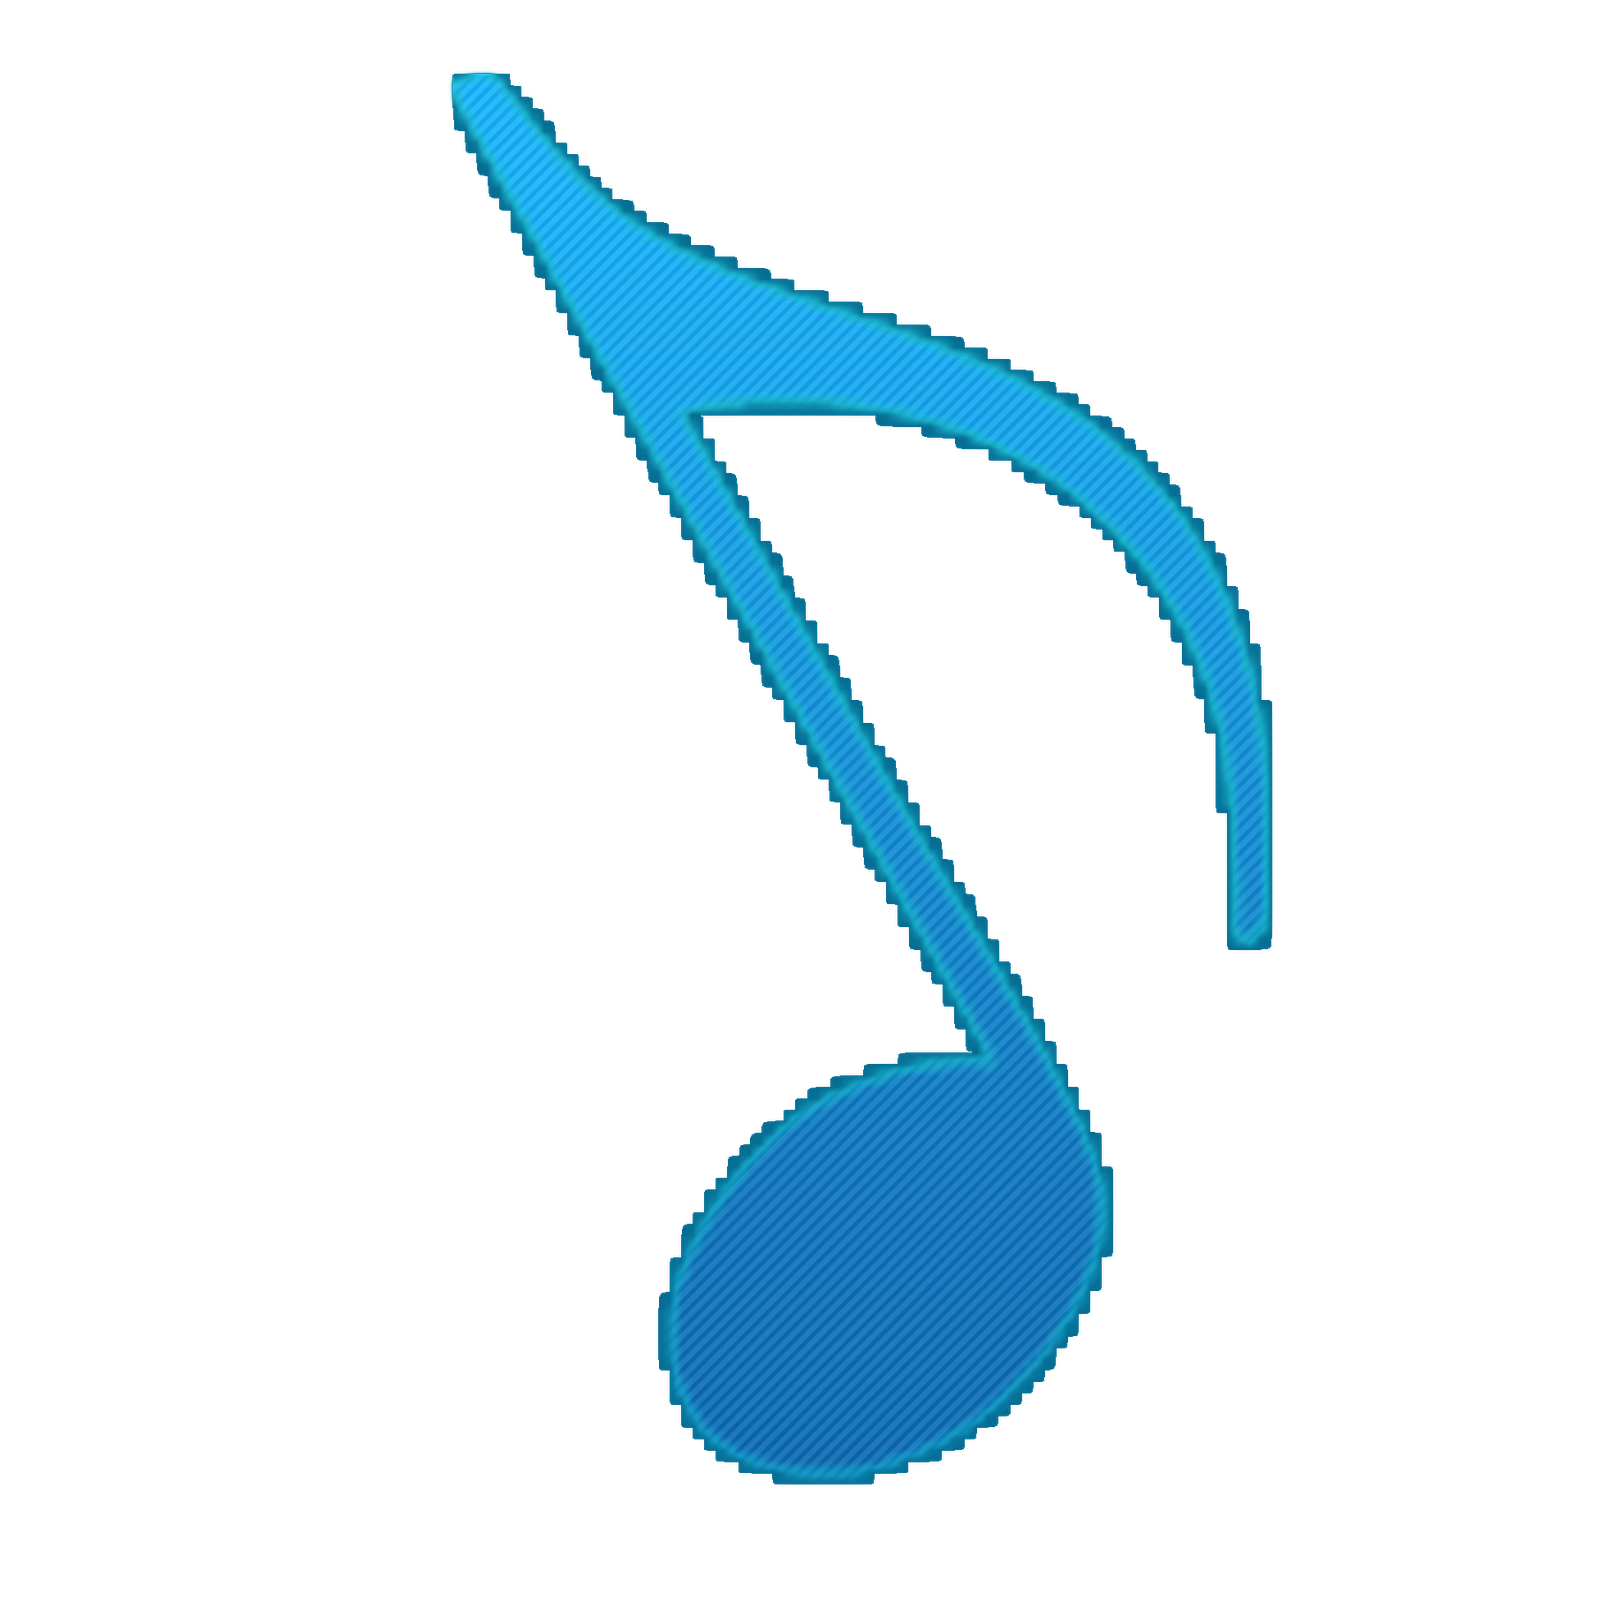 mi mundo magico notas musicales png